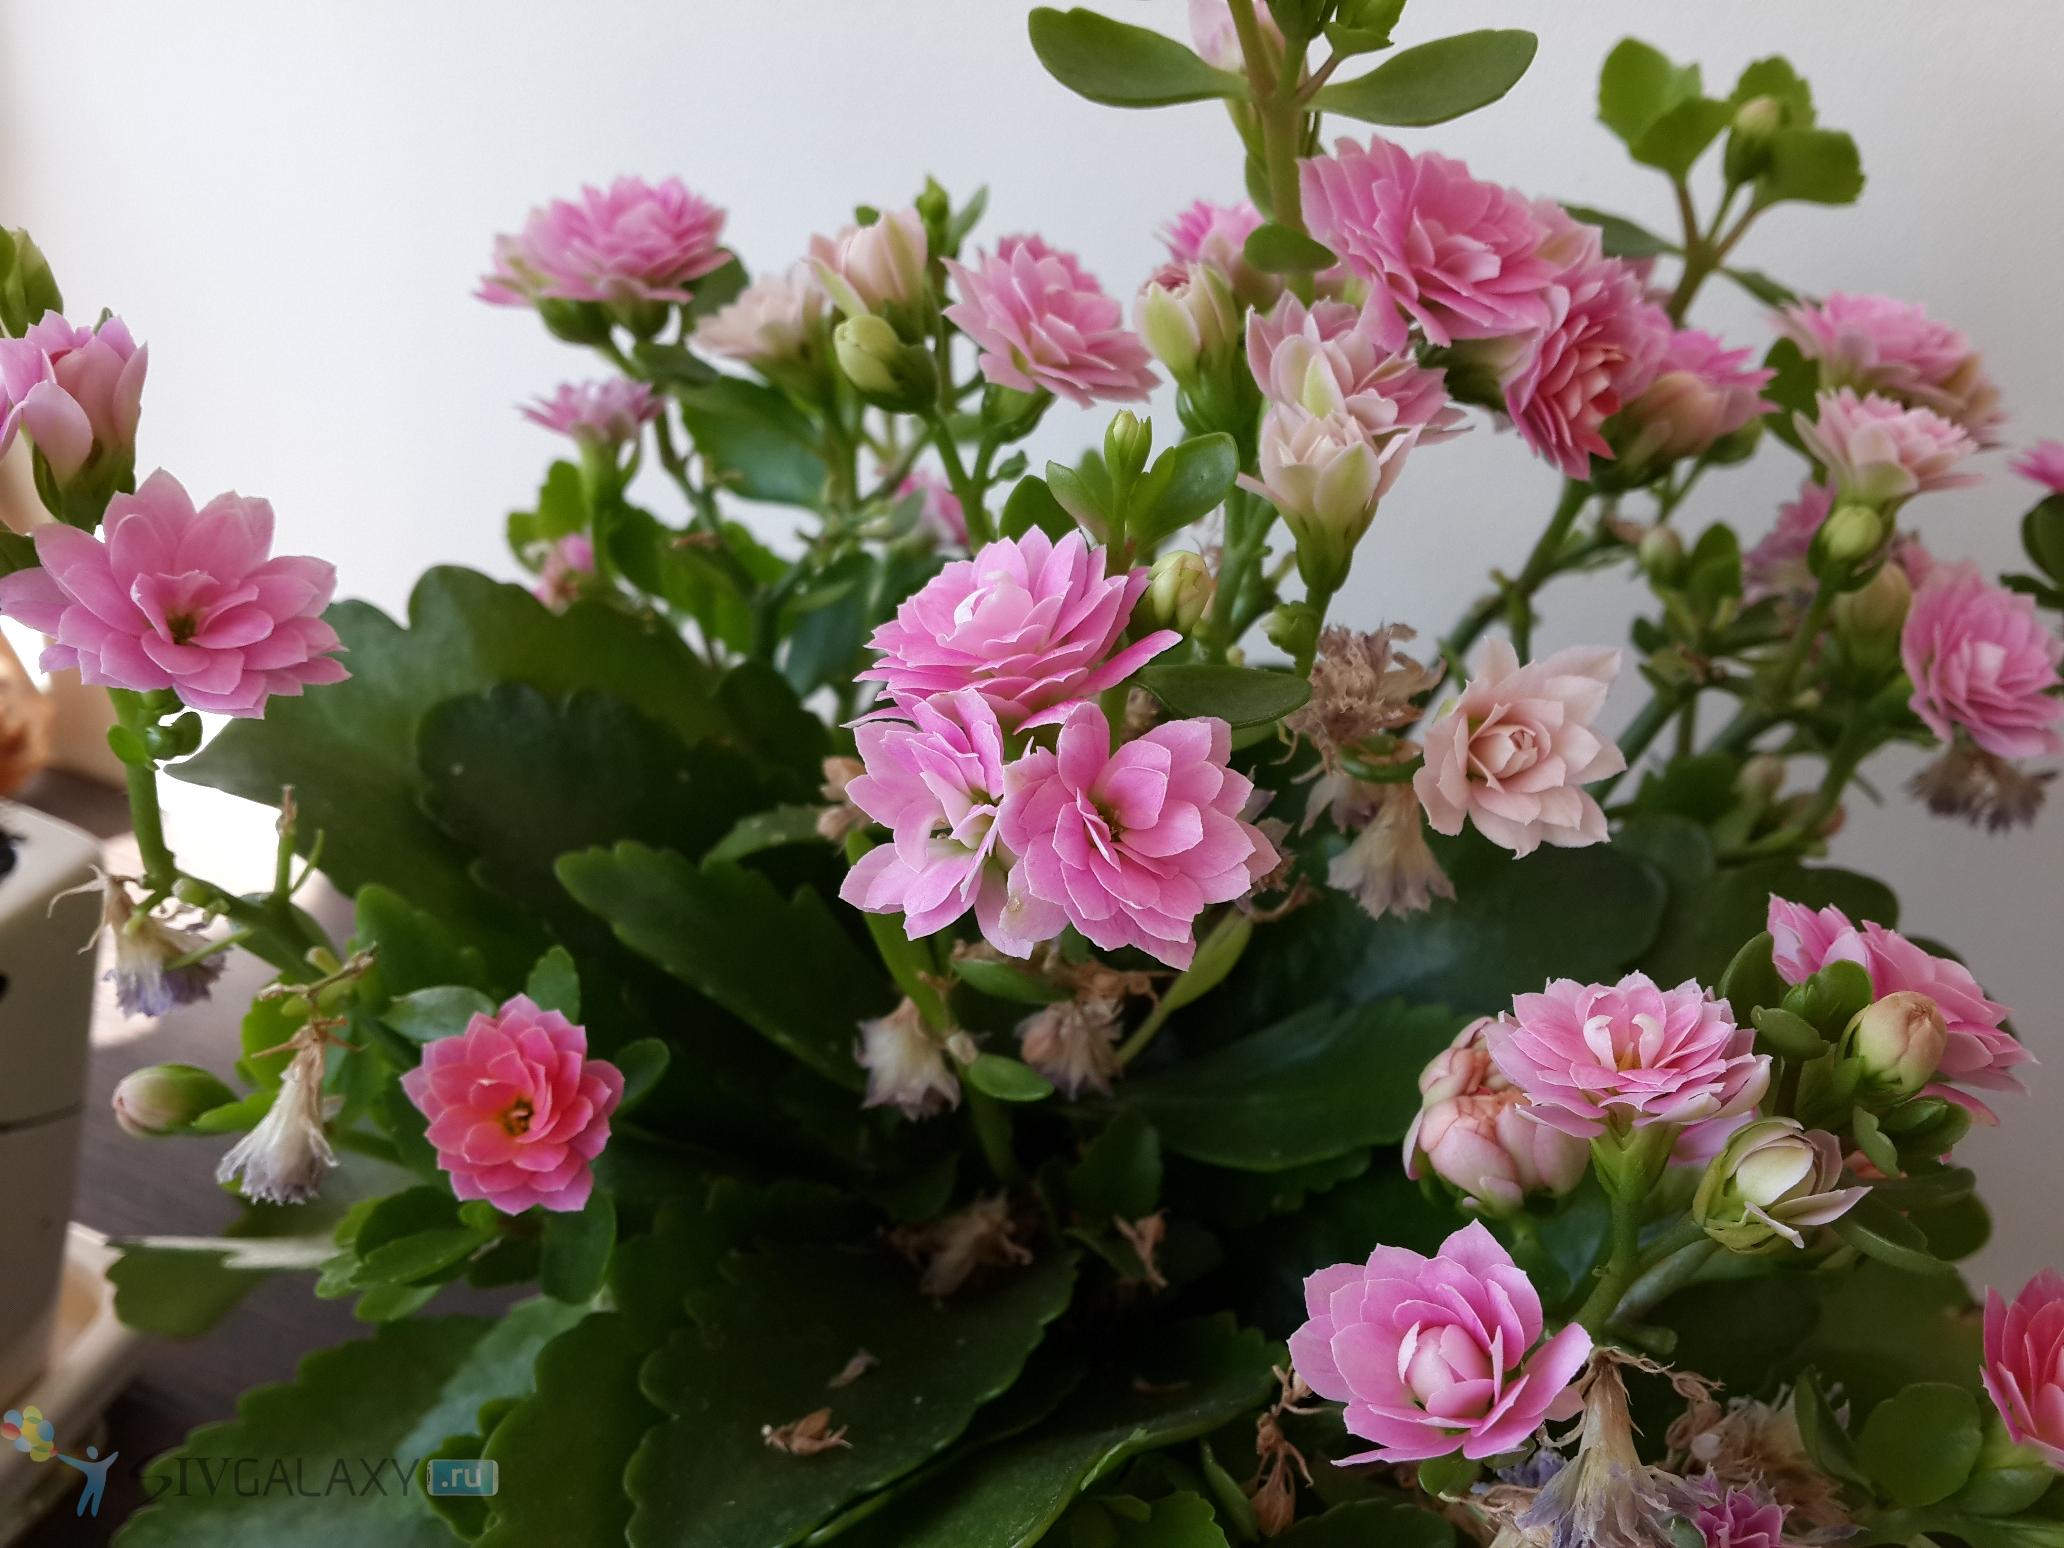 Фото с камеры Samsung Galaxy S4 - цветочки